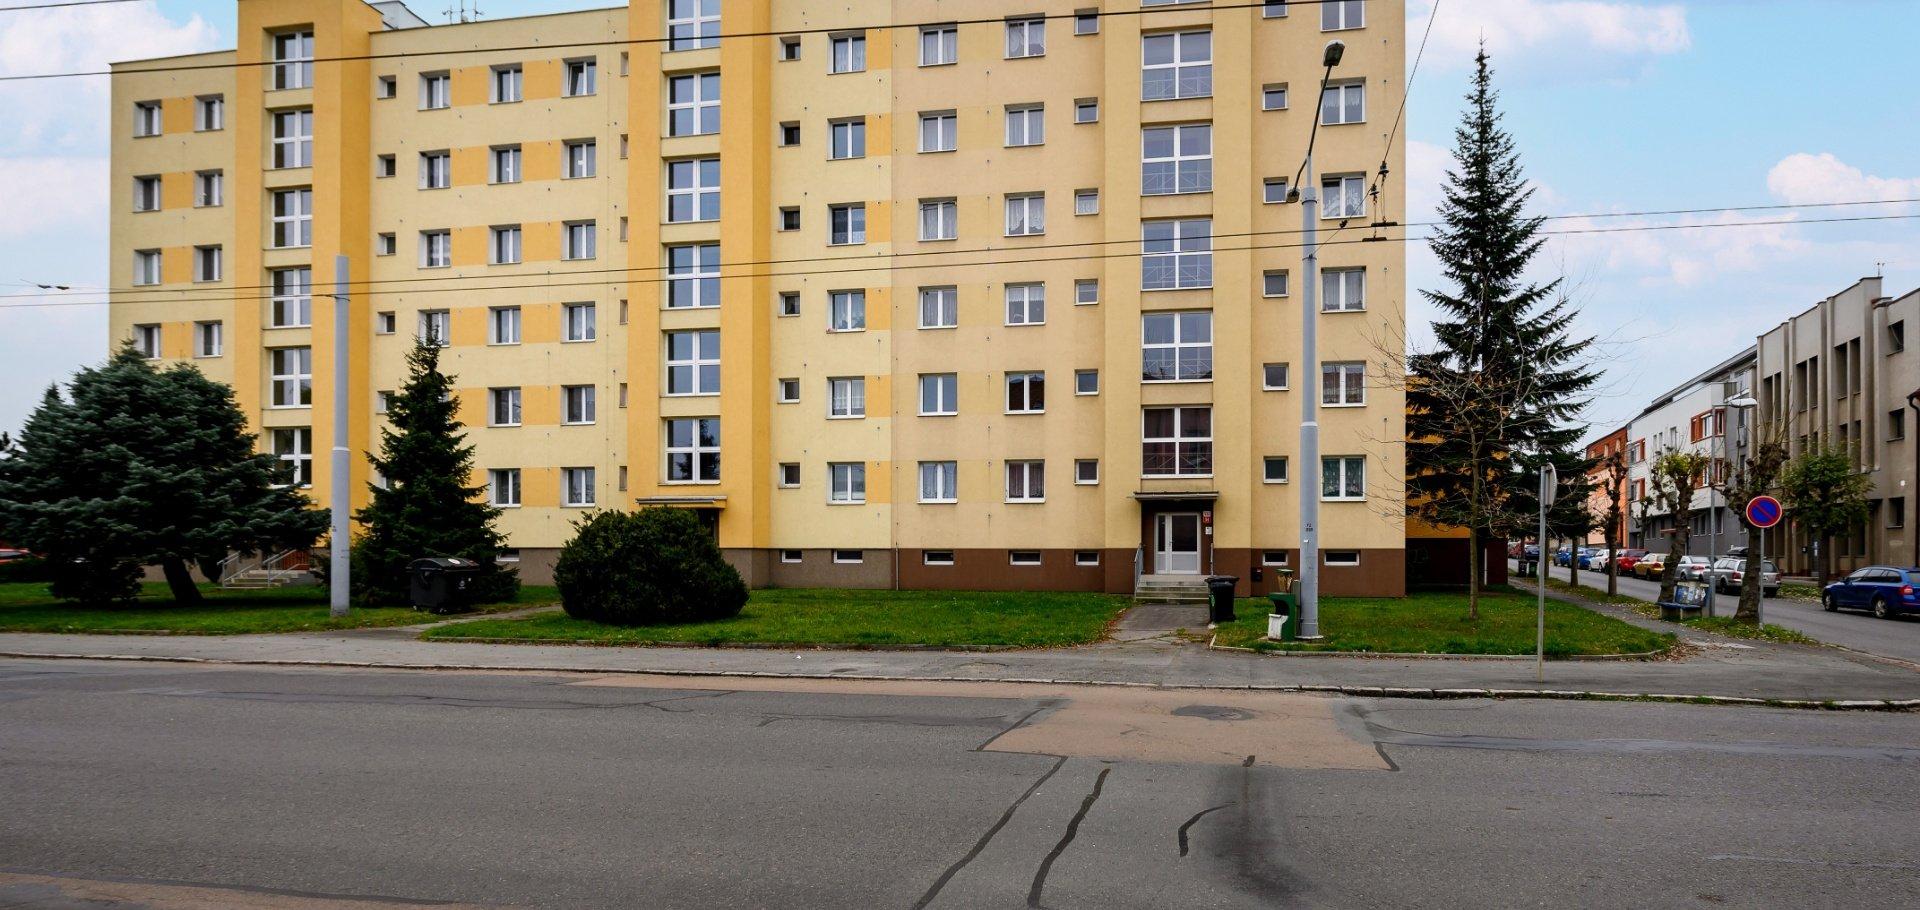 Prodej, Byty 2+kk, 62,90m² - Plzeň - Božkov